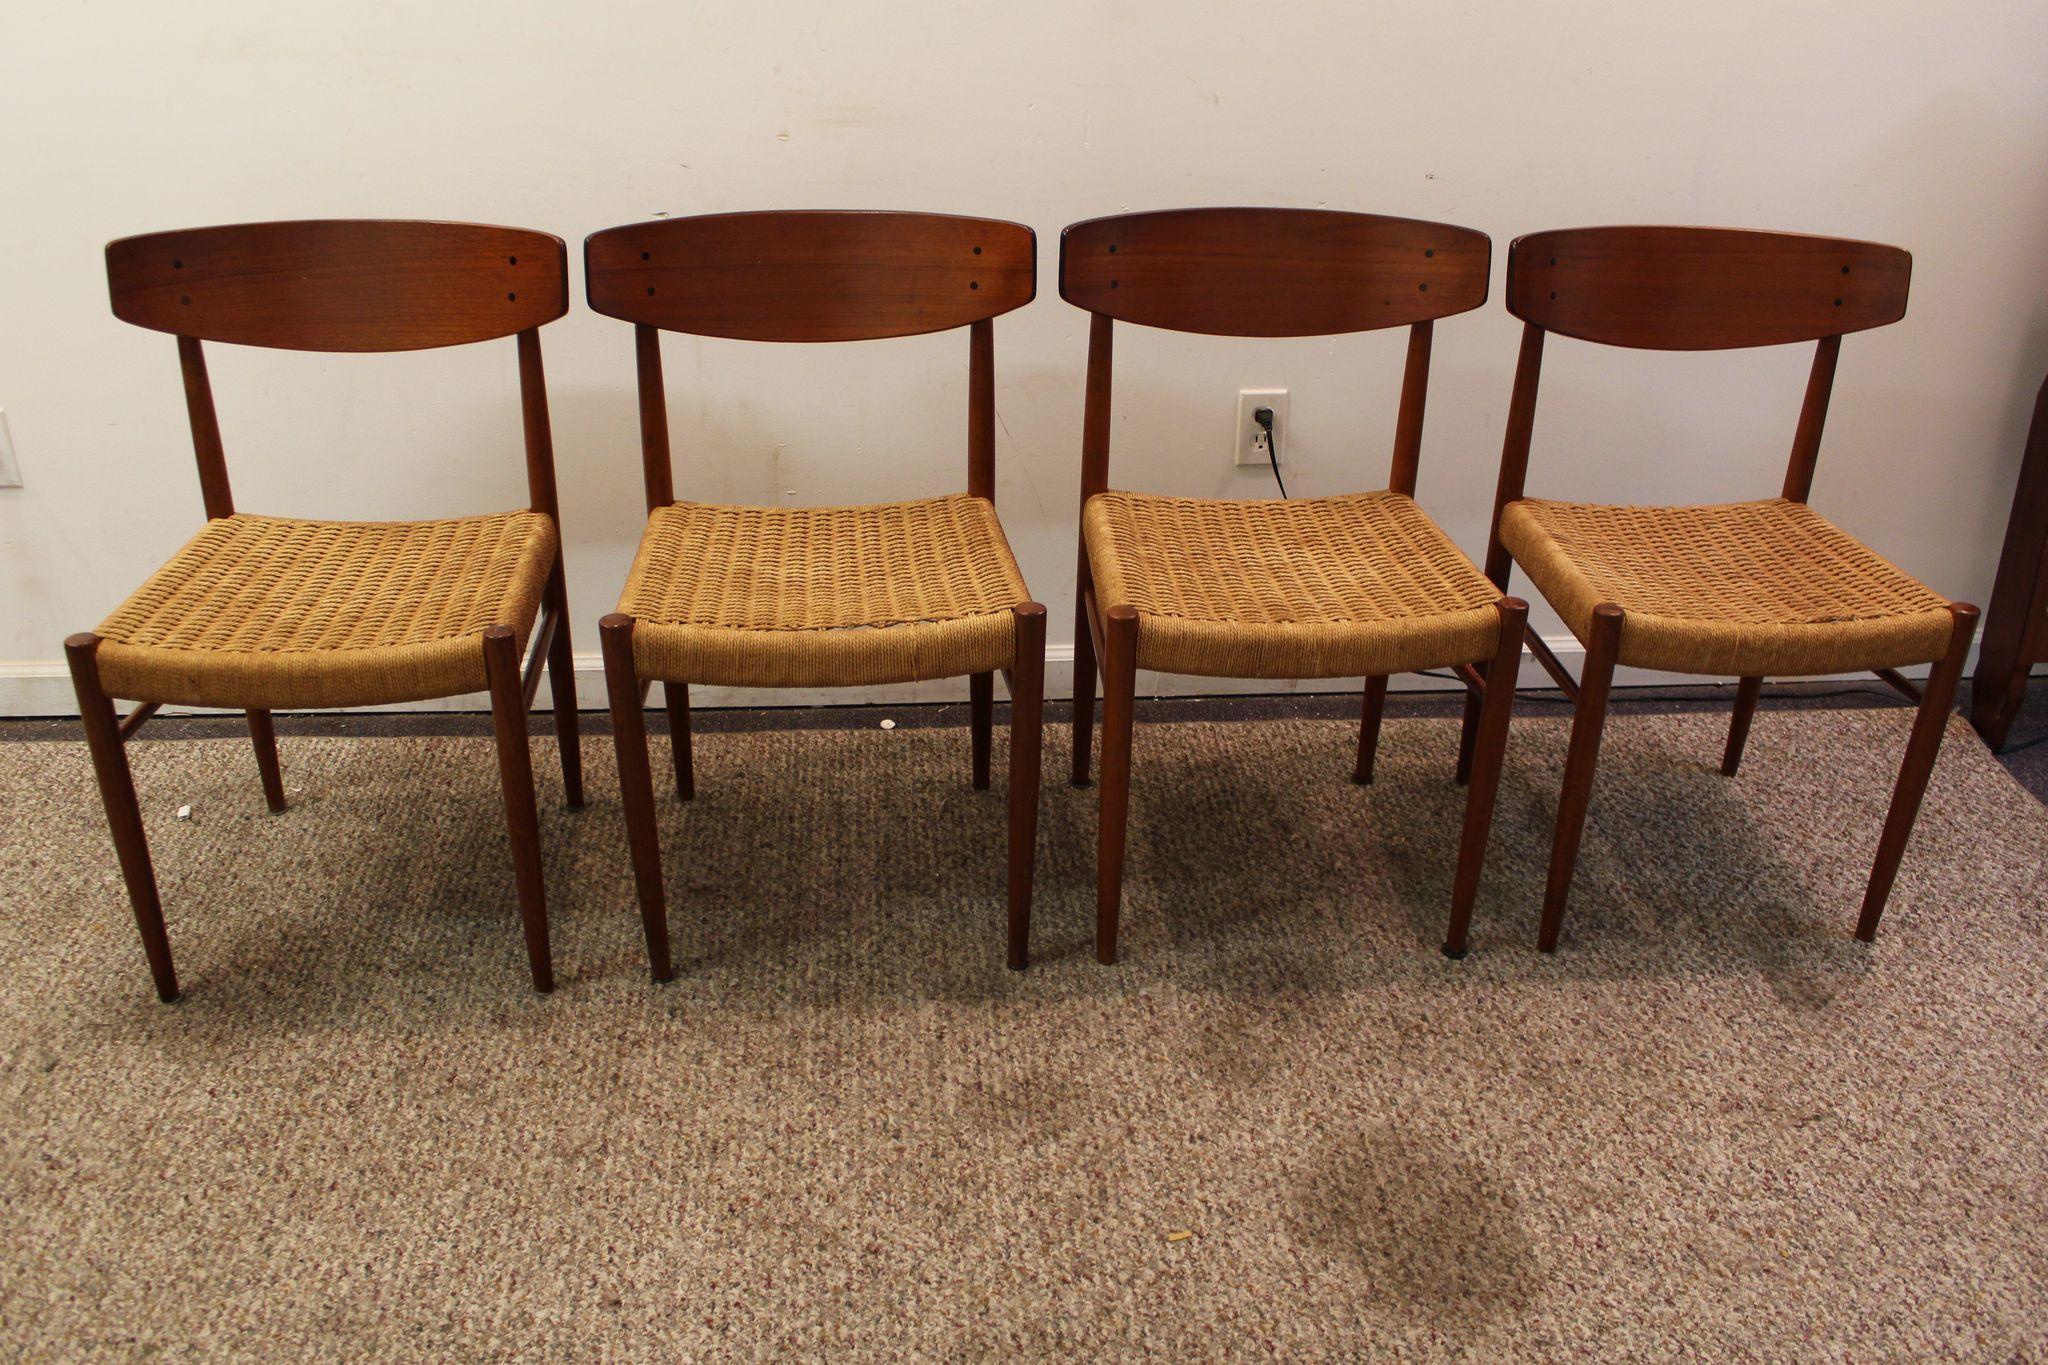 Set of 4 Mid Century Danish Modern Teak Rope Dining Chairs SOLD on